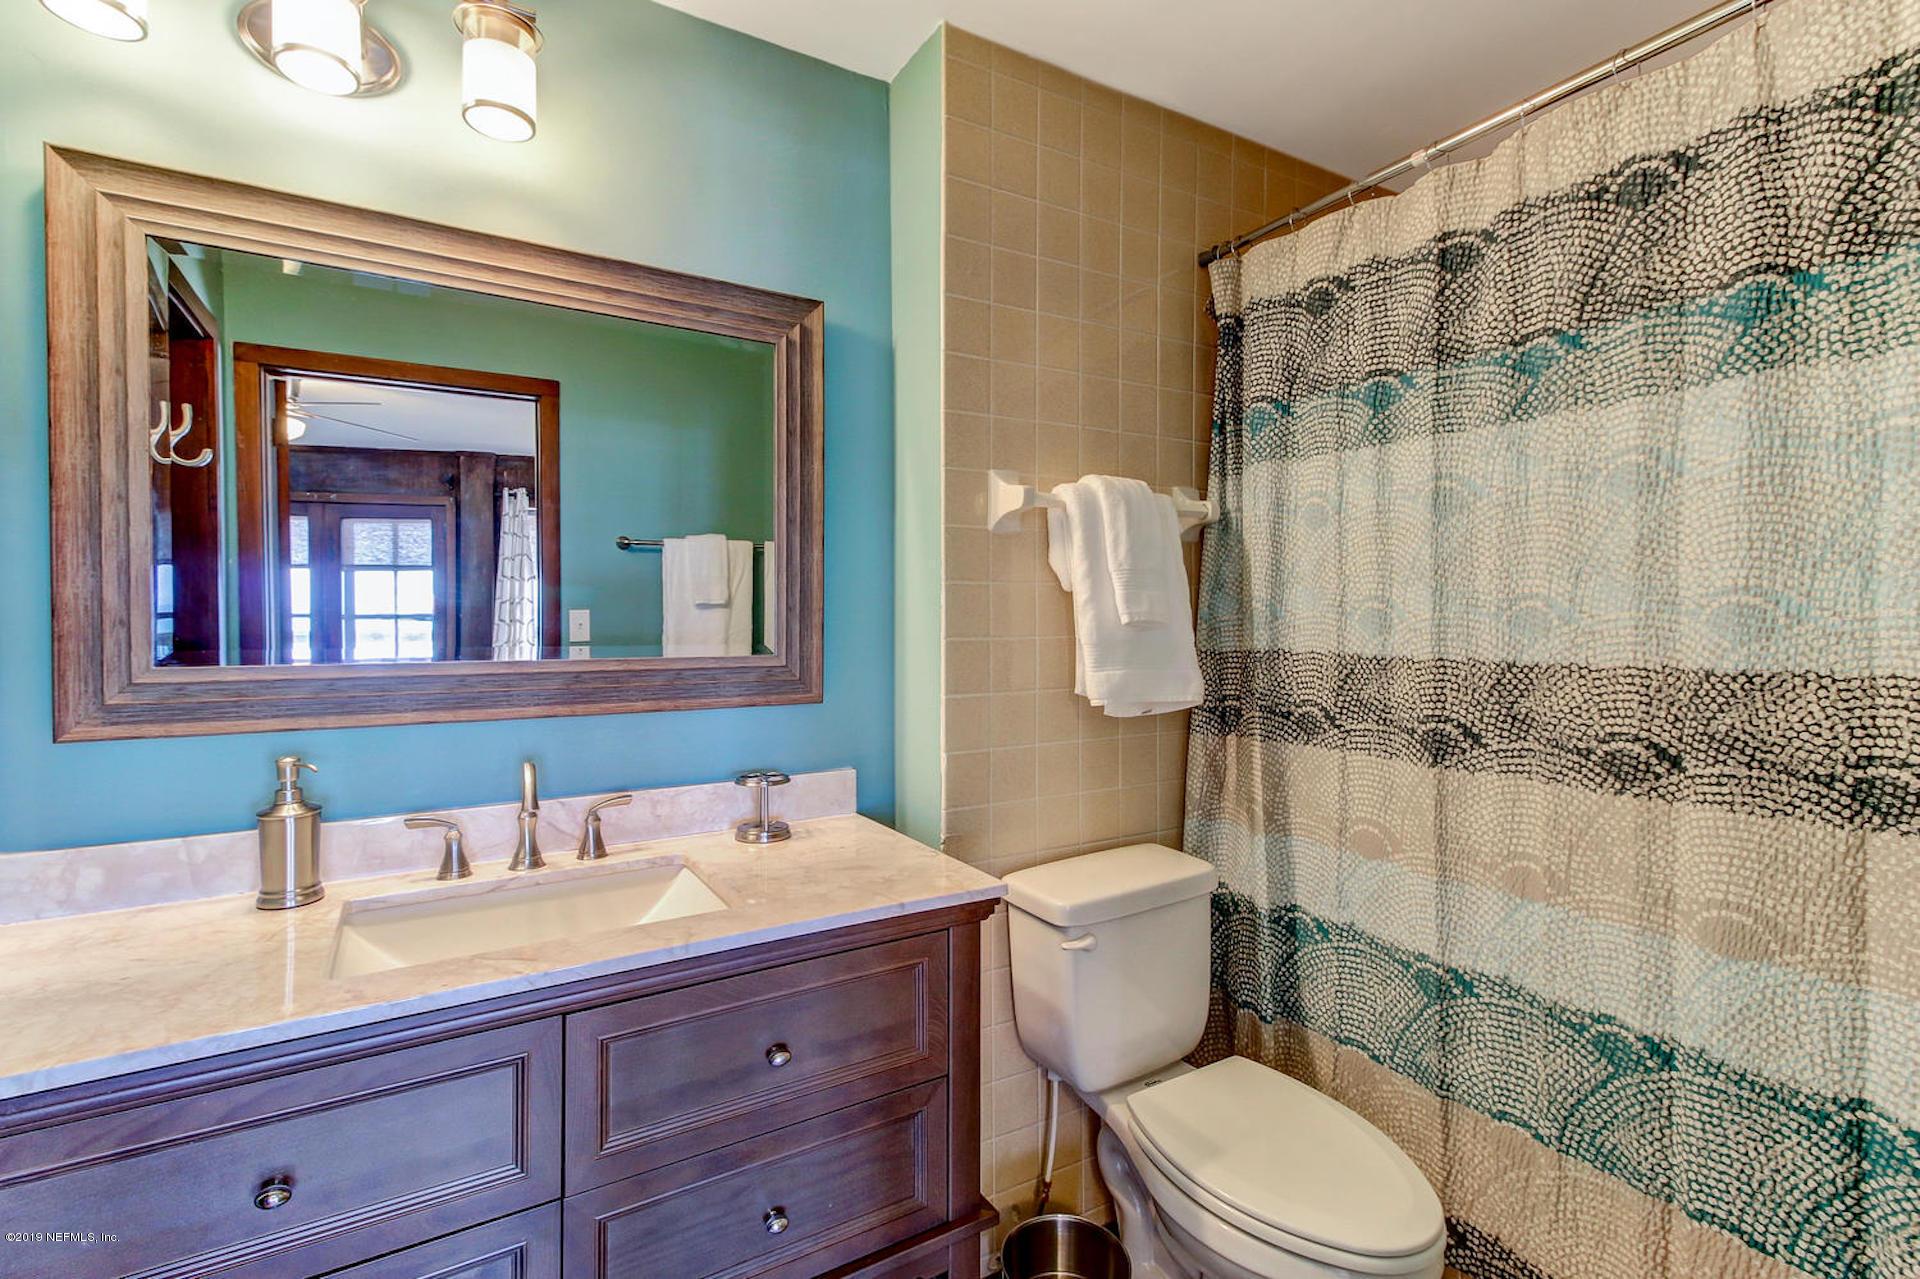 4342 COASTAL, ST AUGUSTINE, FLORIDA 32084, 3 Bedrooms Bedrooms, ,2 BathroomsBathrooms,Single family,For sale,COASTAL,973993